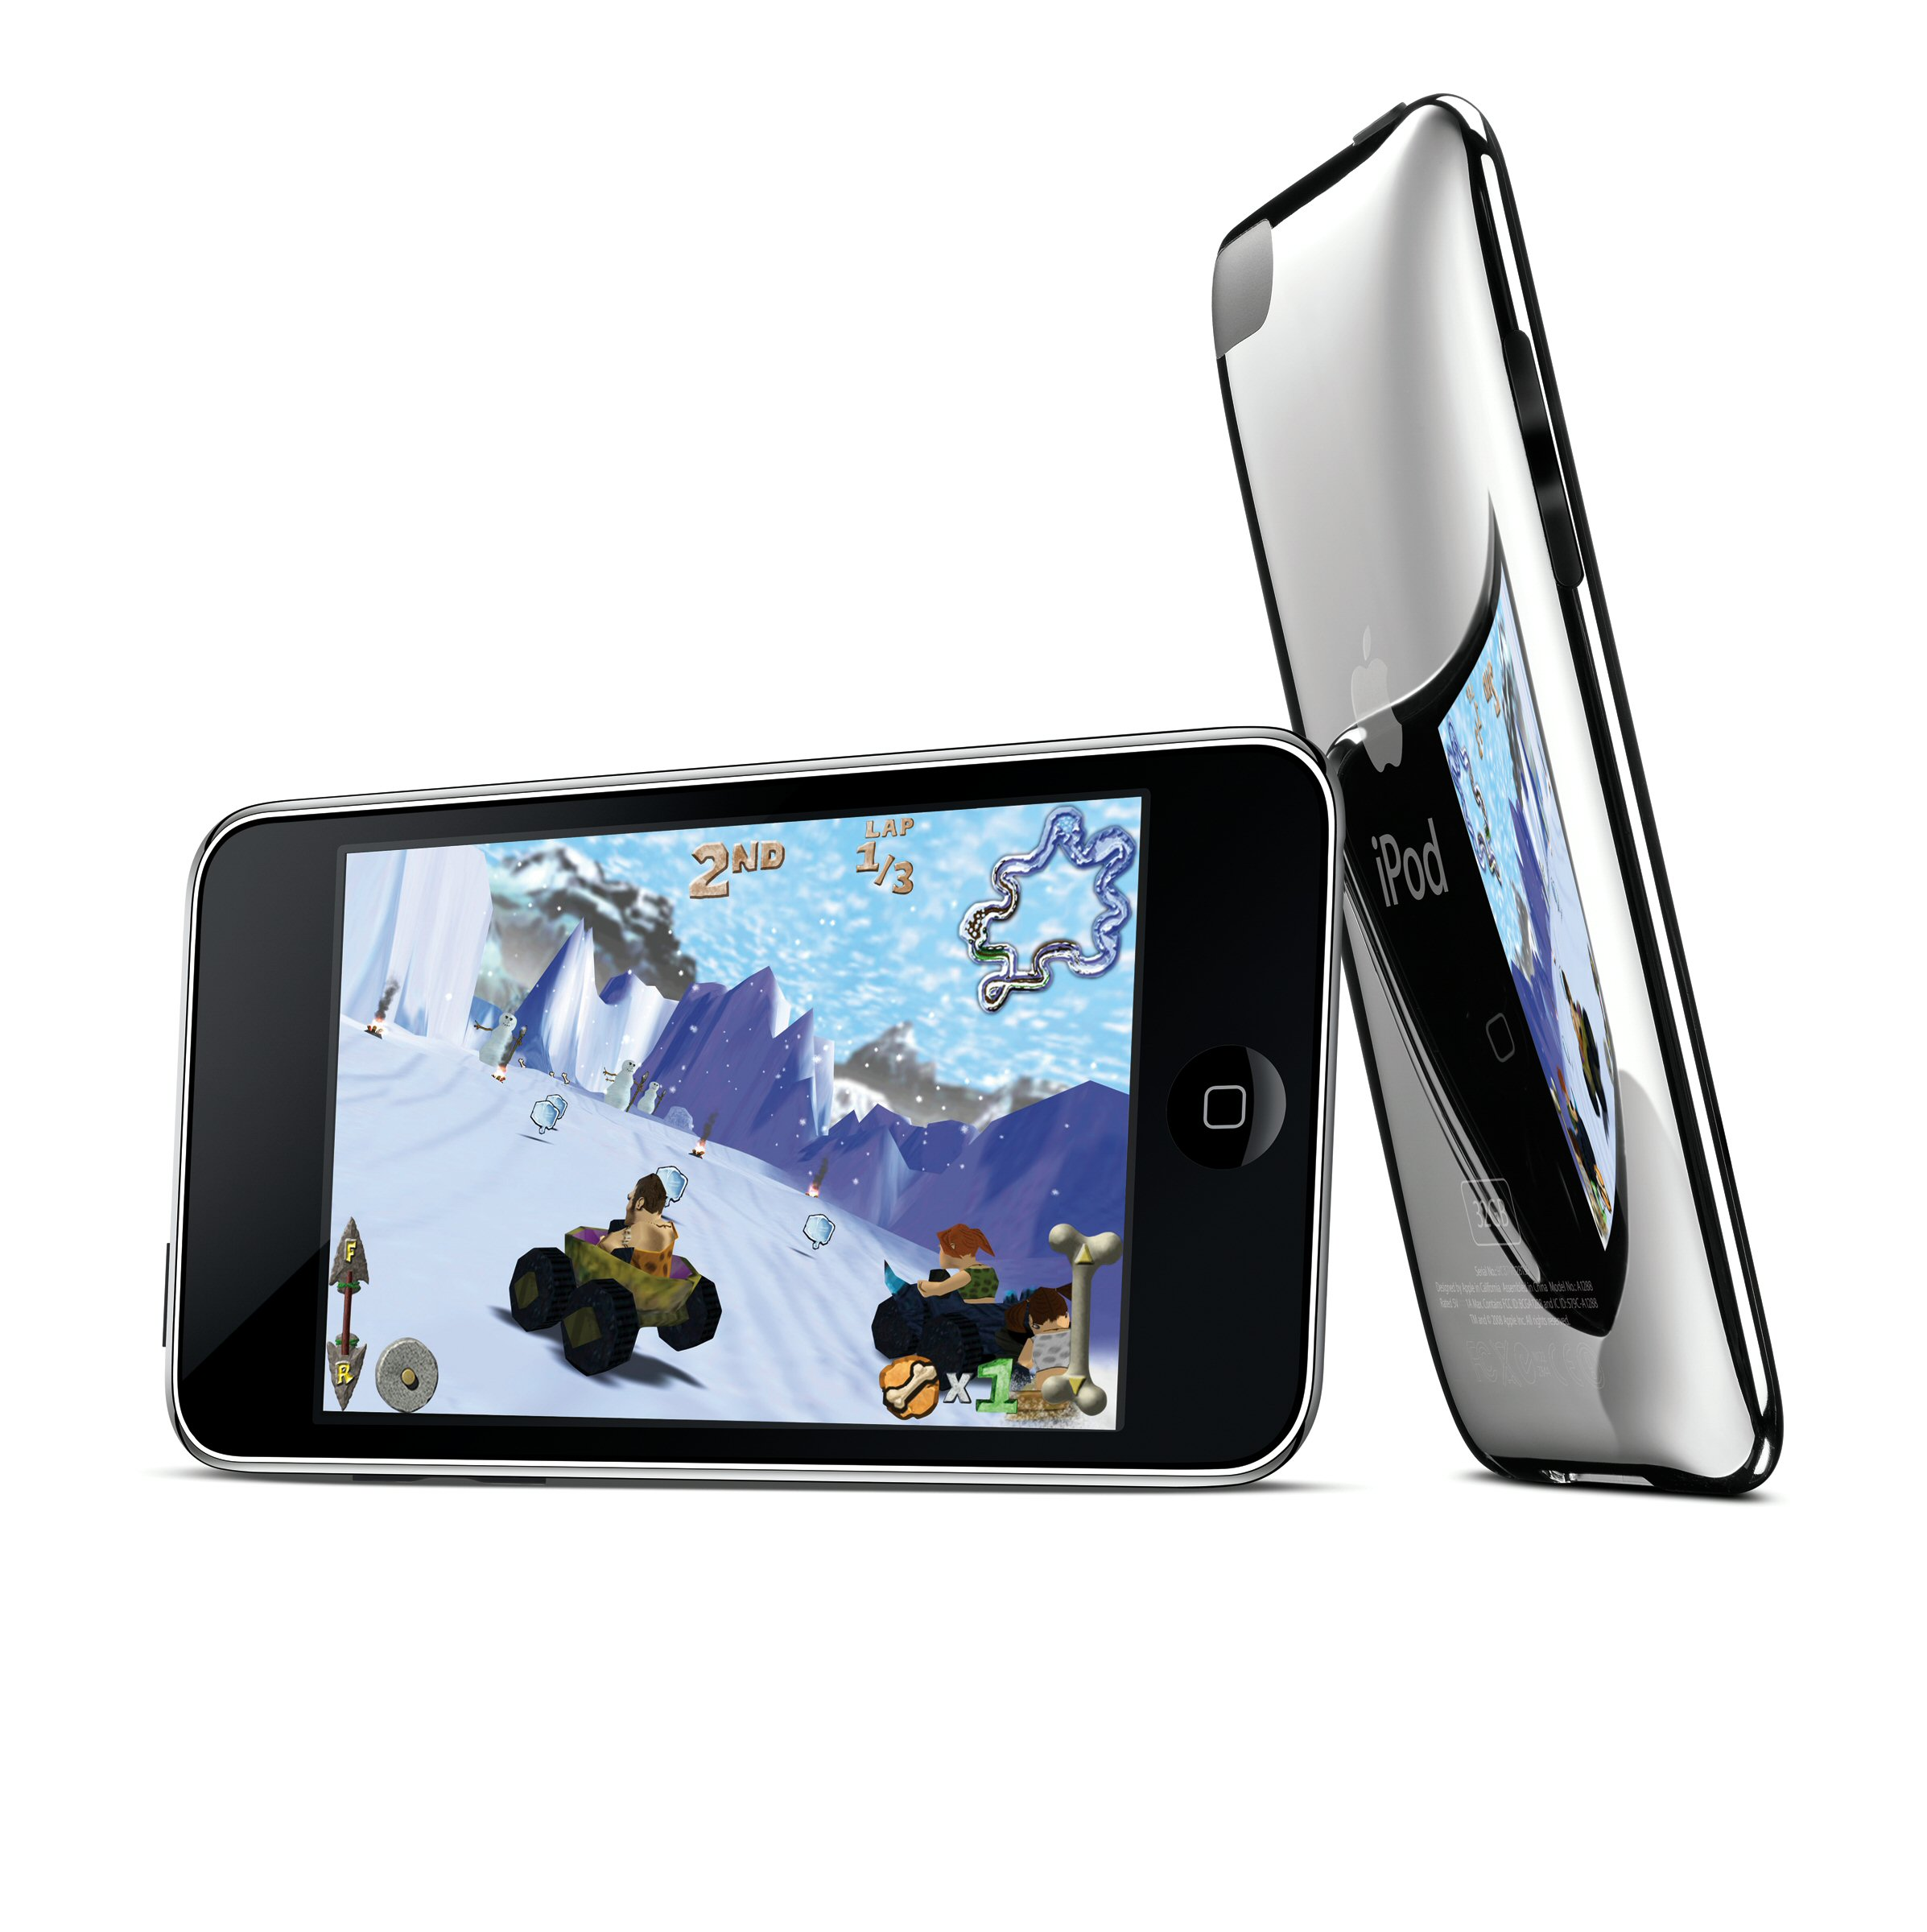 New iPod touch 32GB (2nd Gen) review   TechRadar